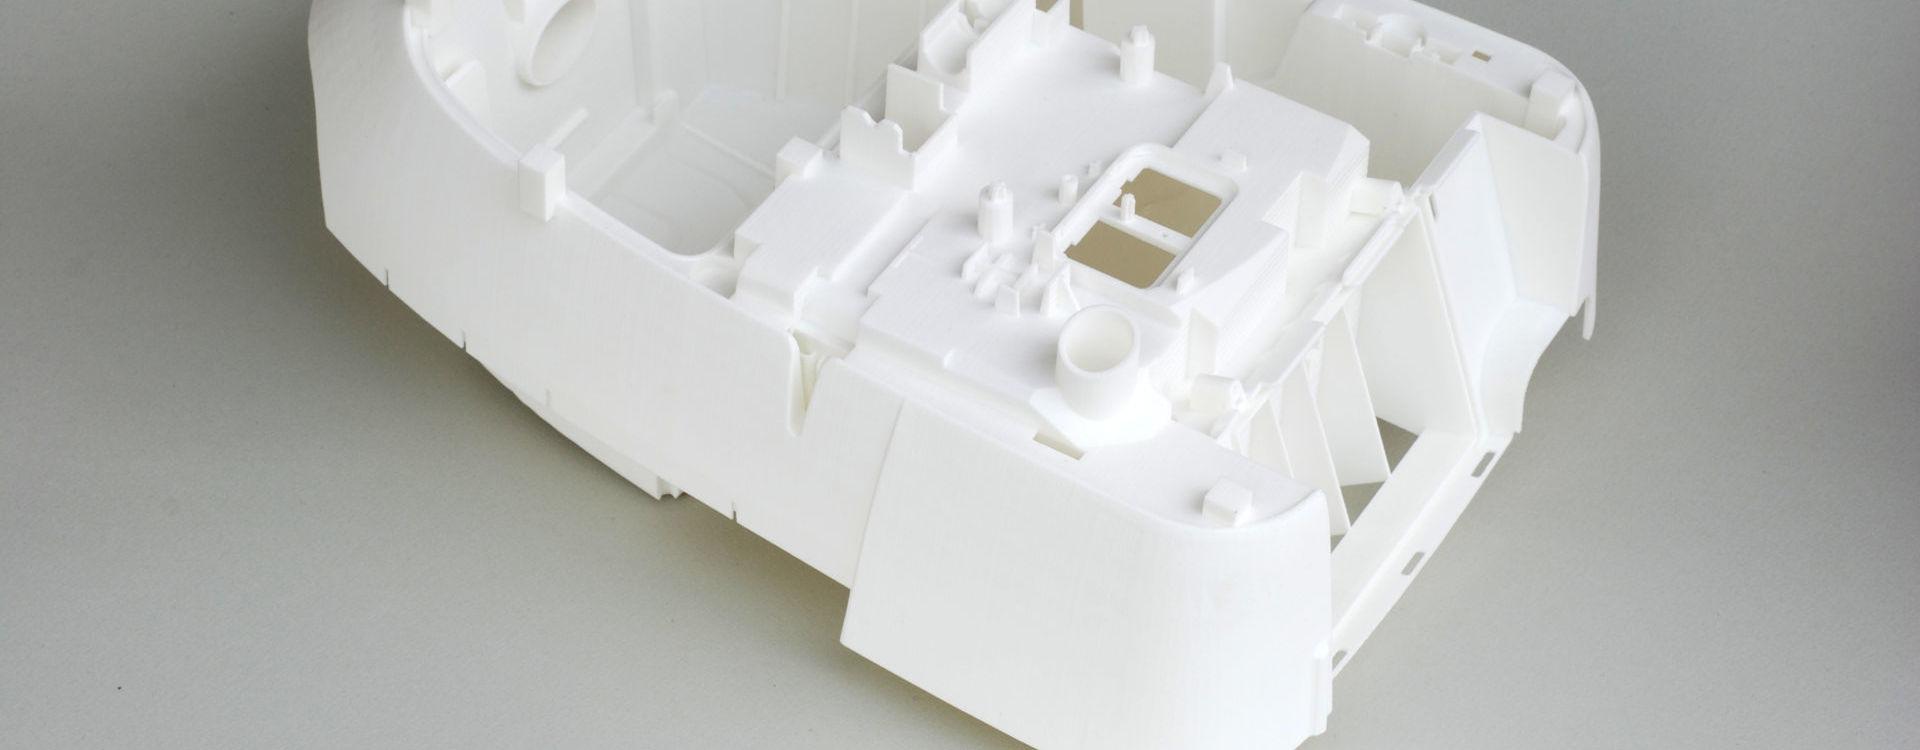 Selektives Lasersintern SLS Kleinserienproduktion Elektroindustrie